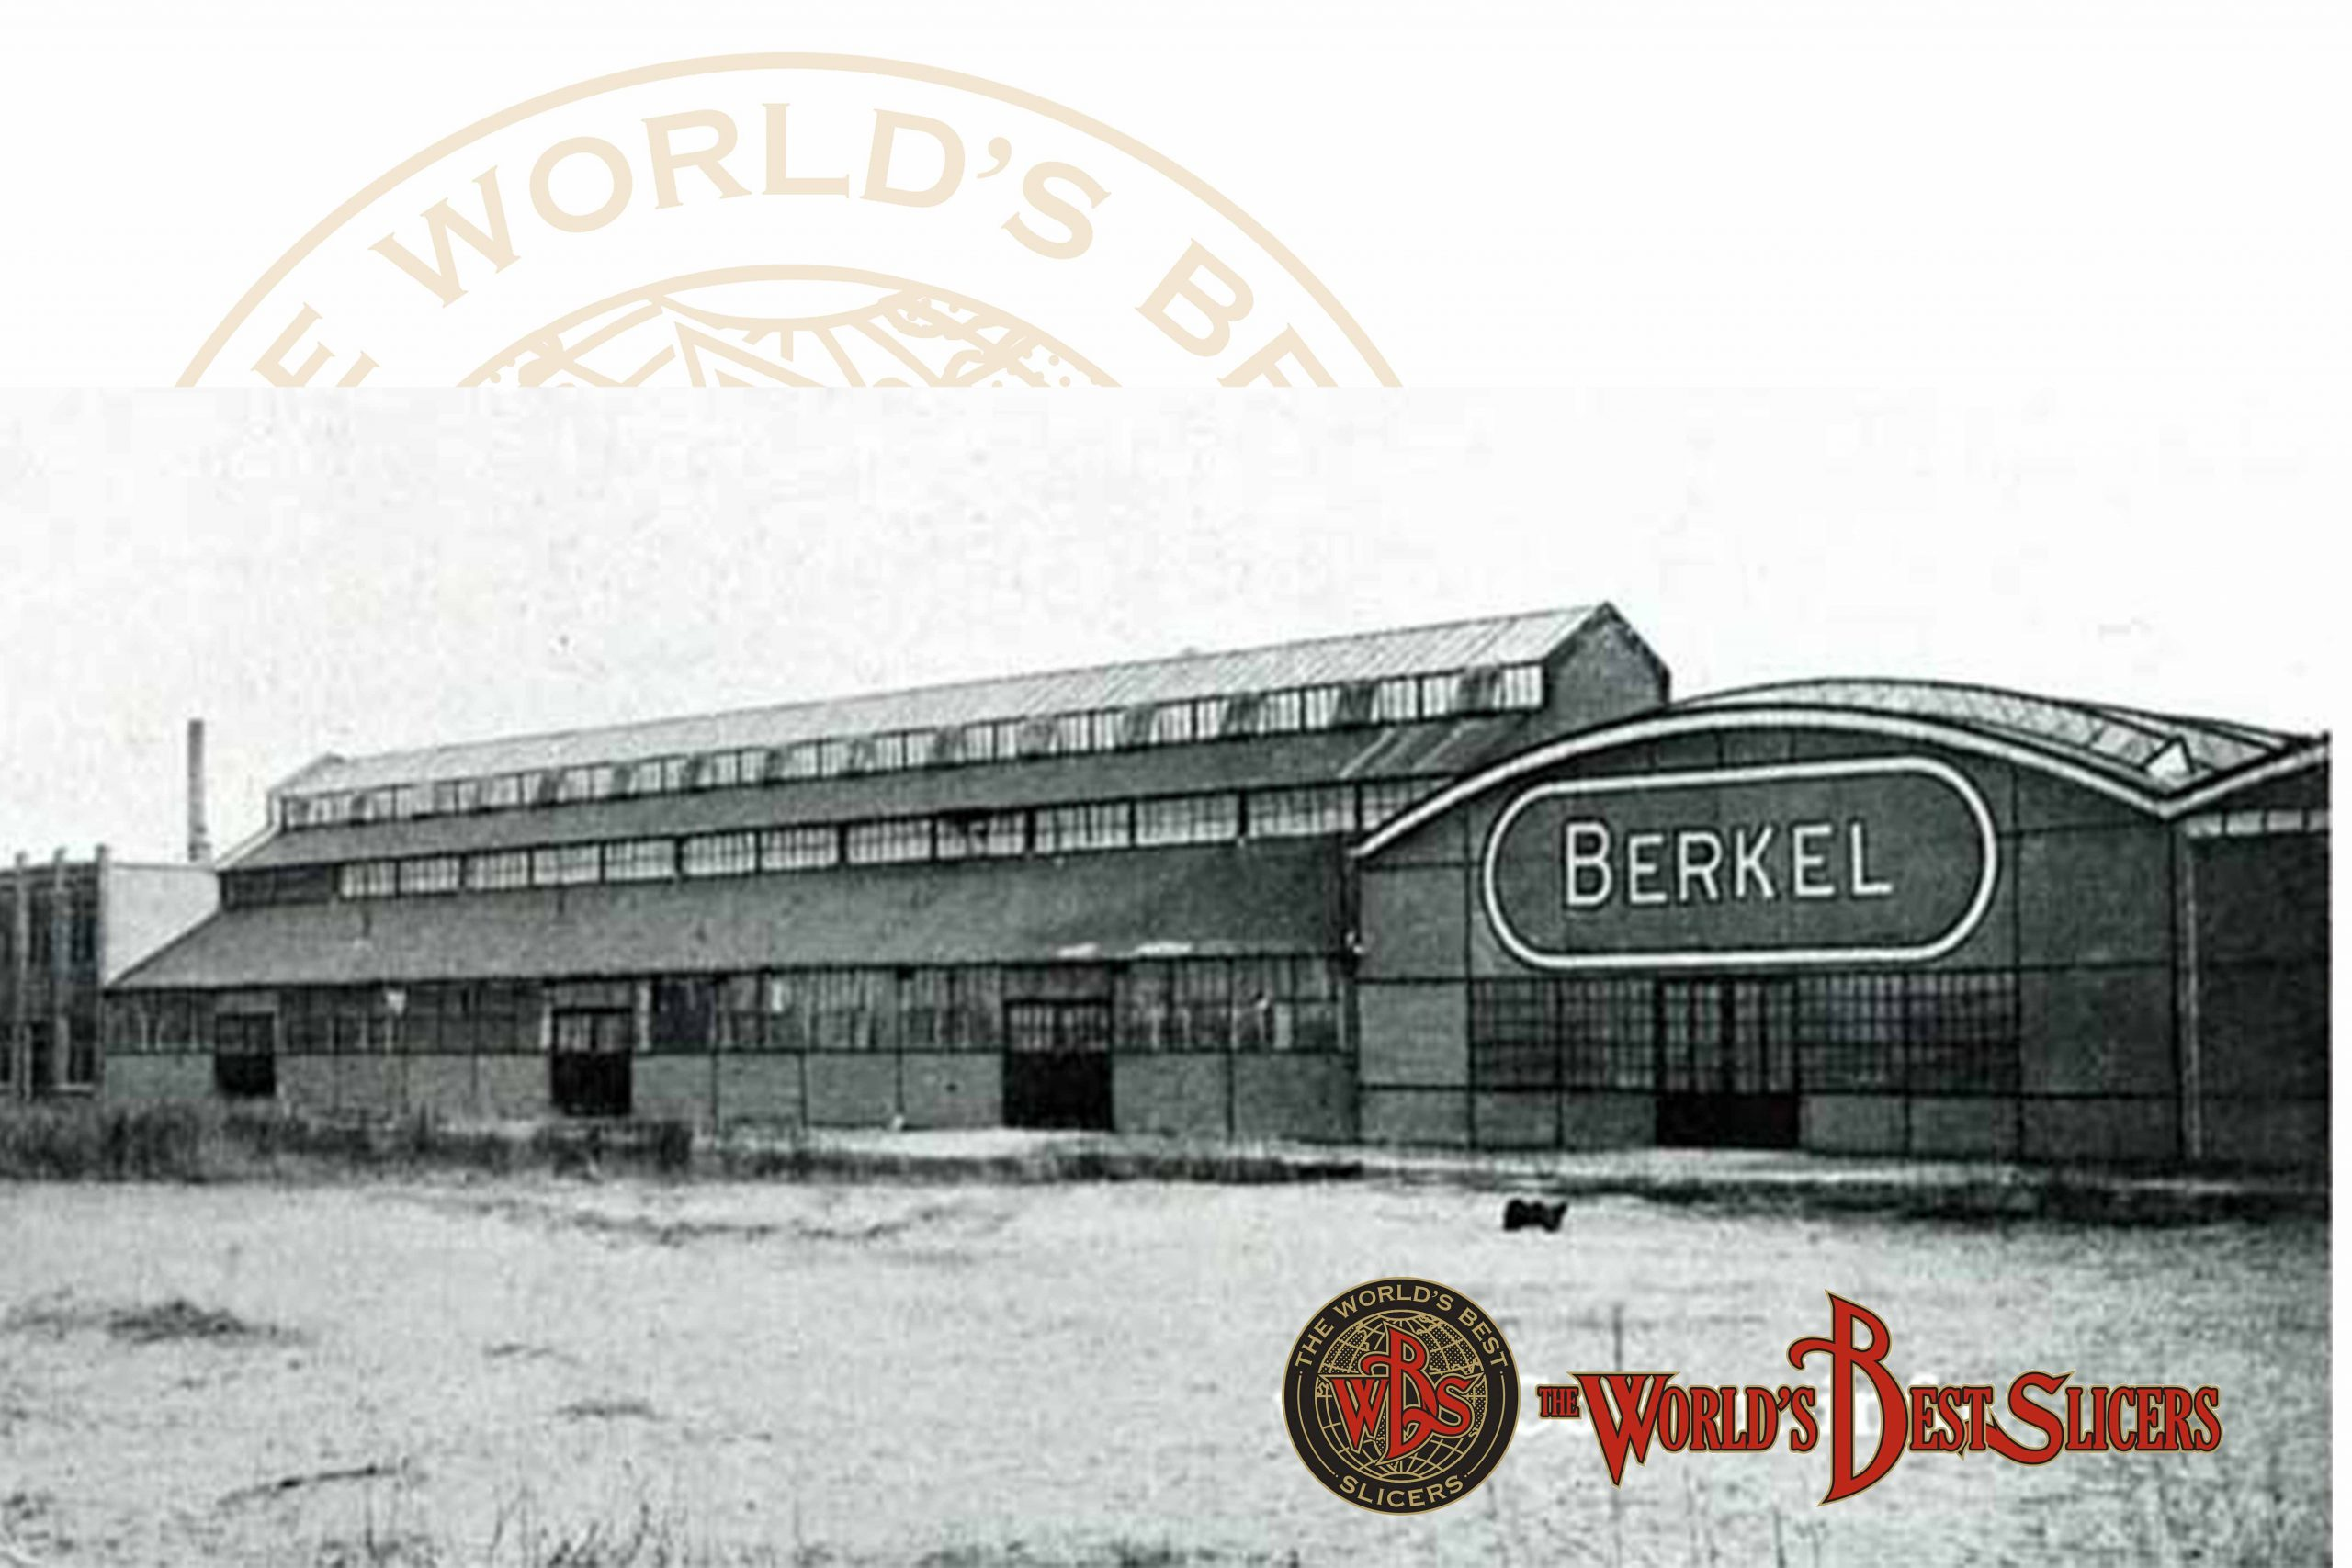 hp1-scaled W.A.Van Berkel's Geschichte